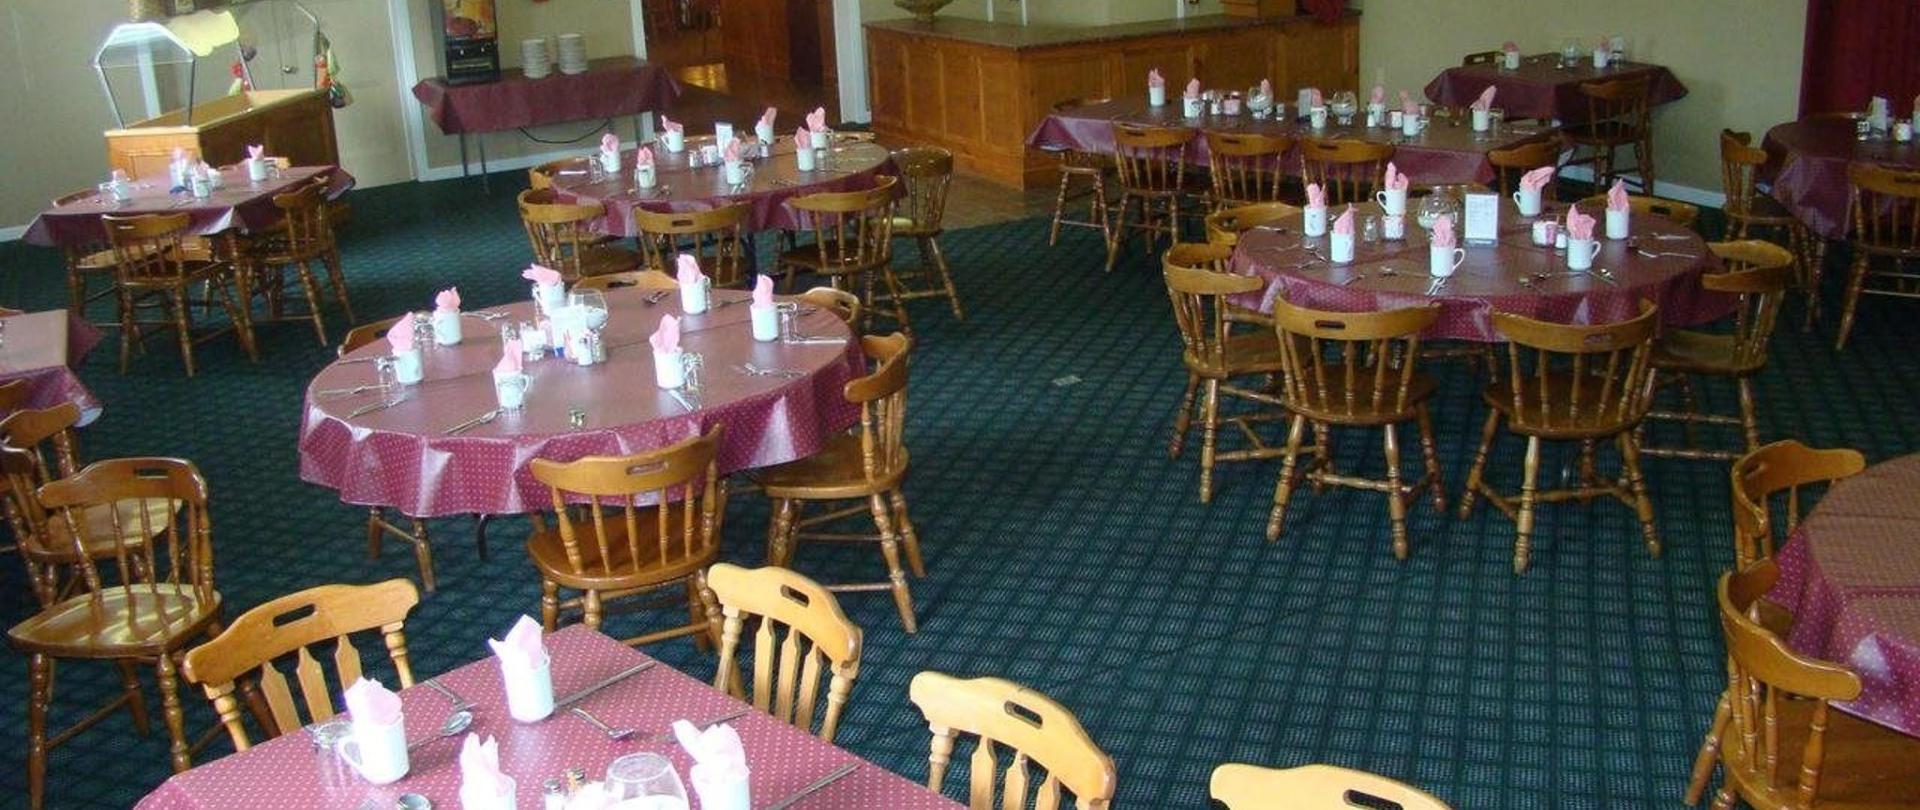 Colonial dining 2.jpg